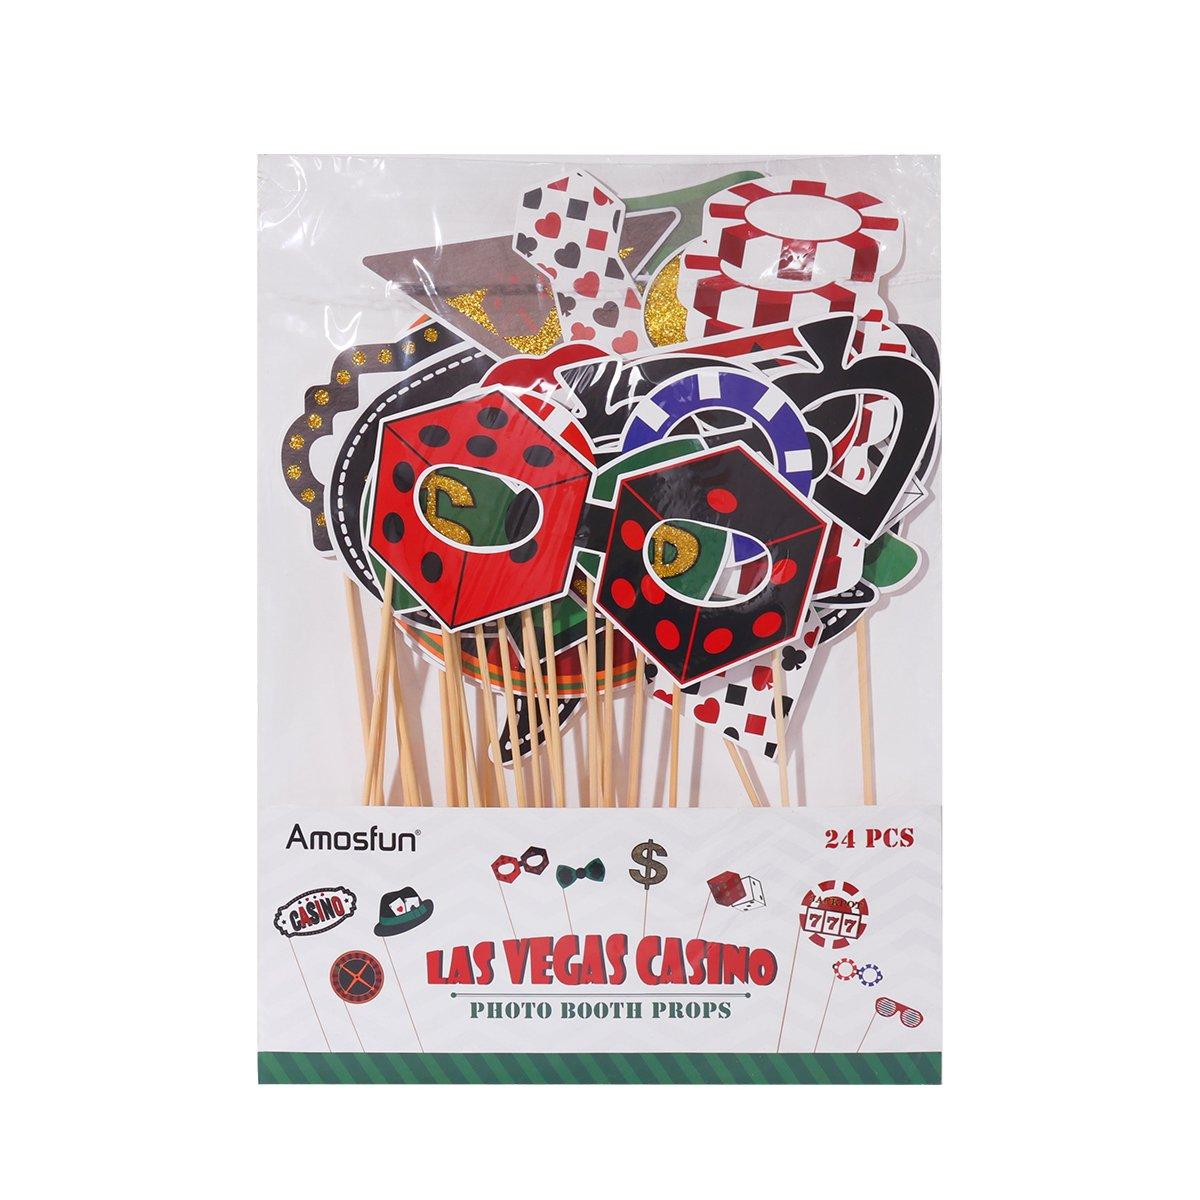 LUOEM Las Vegas Casino Photo Booth Props Kit 24Pcs Las Vegas Party Photo Booth Props with Wooden Sticks